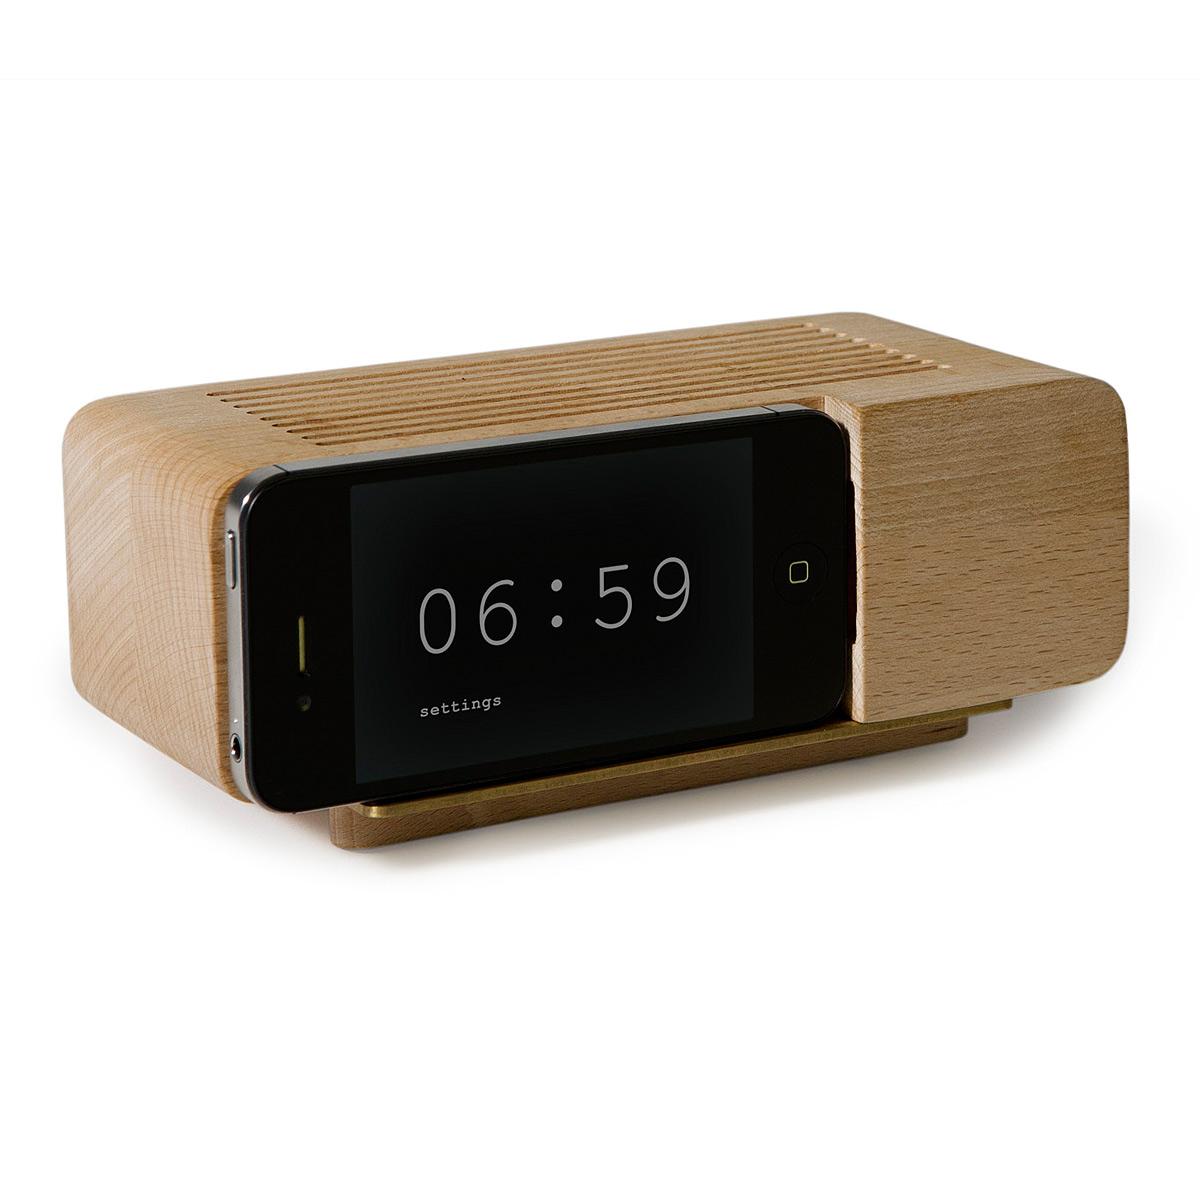 IPHONE ALARM DOCK | Wood Alarm Clock, Areaware | UncommonGoods: http://www.uncommongoods.com/product/iphone-alarm-dock